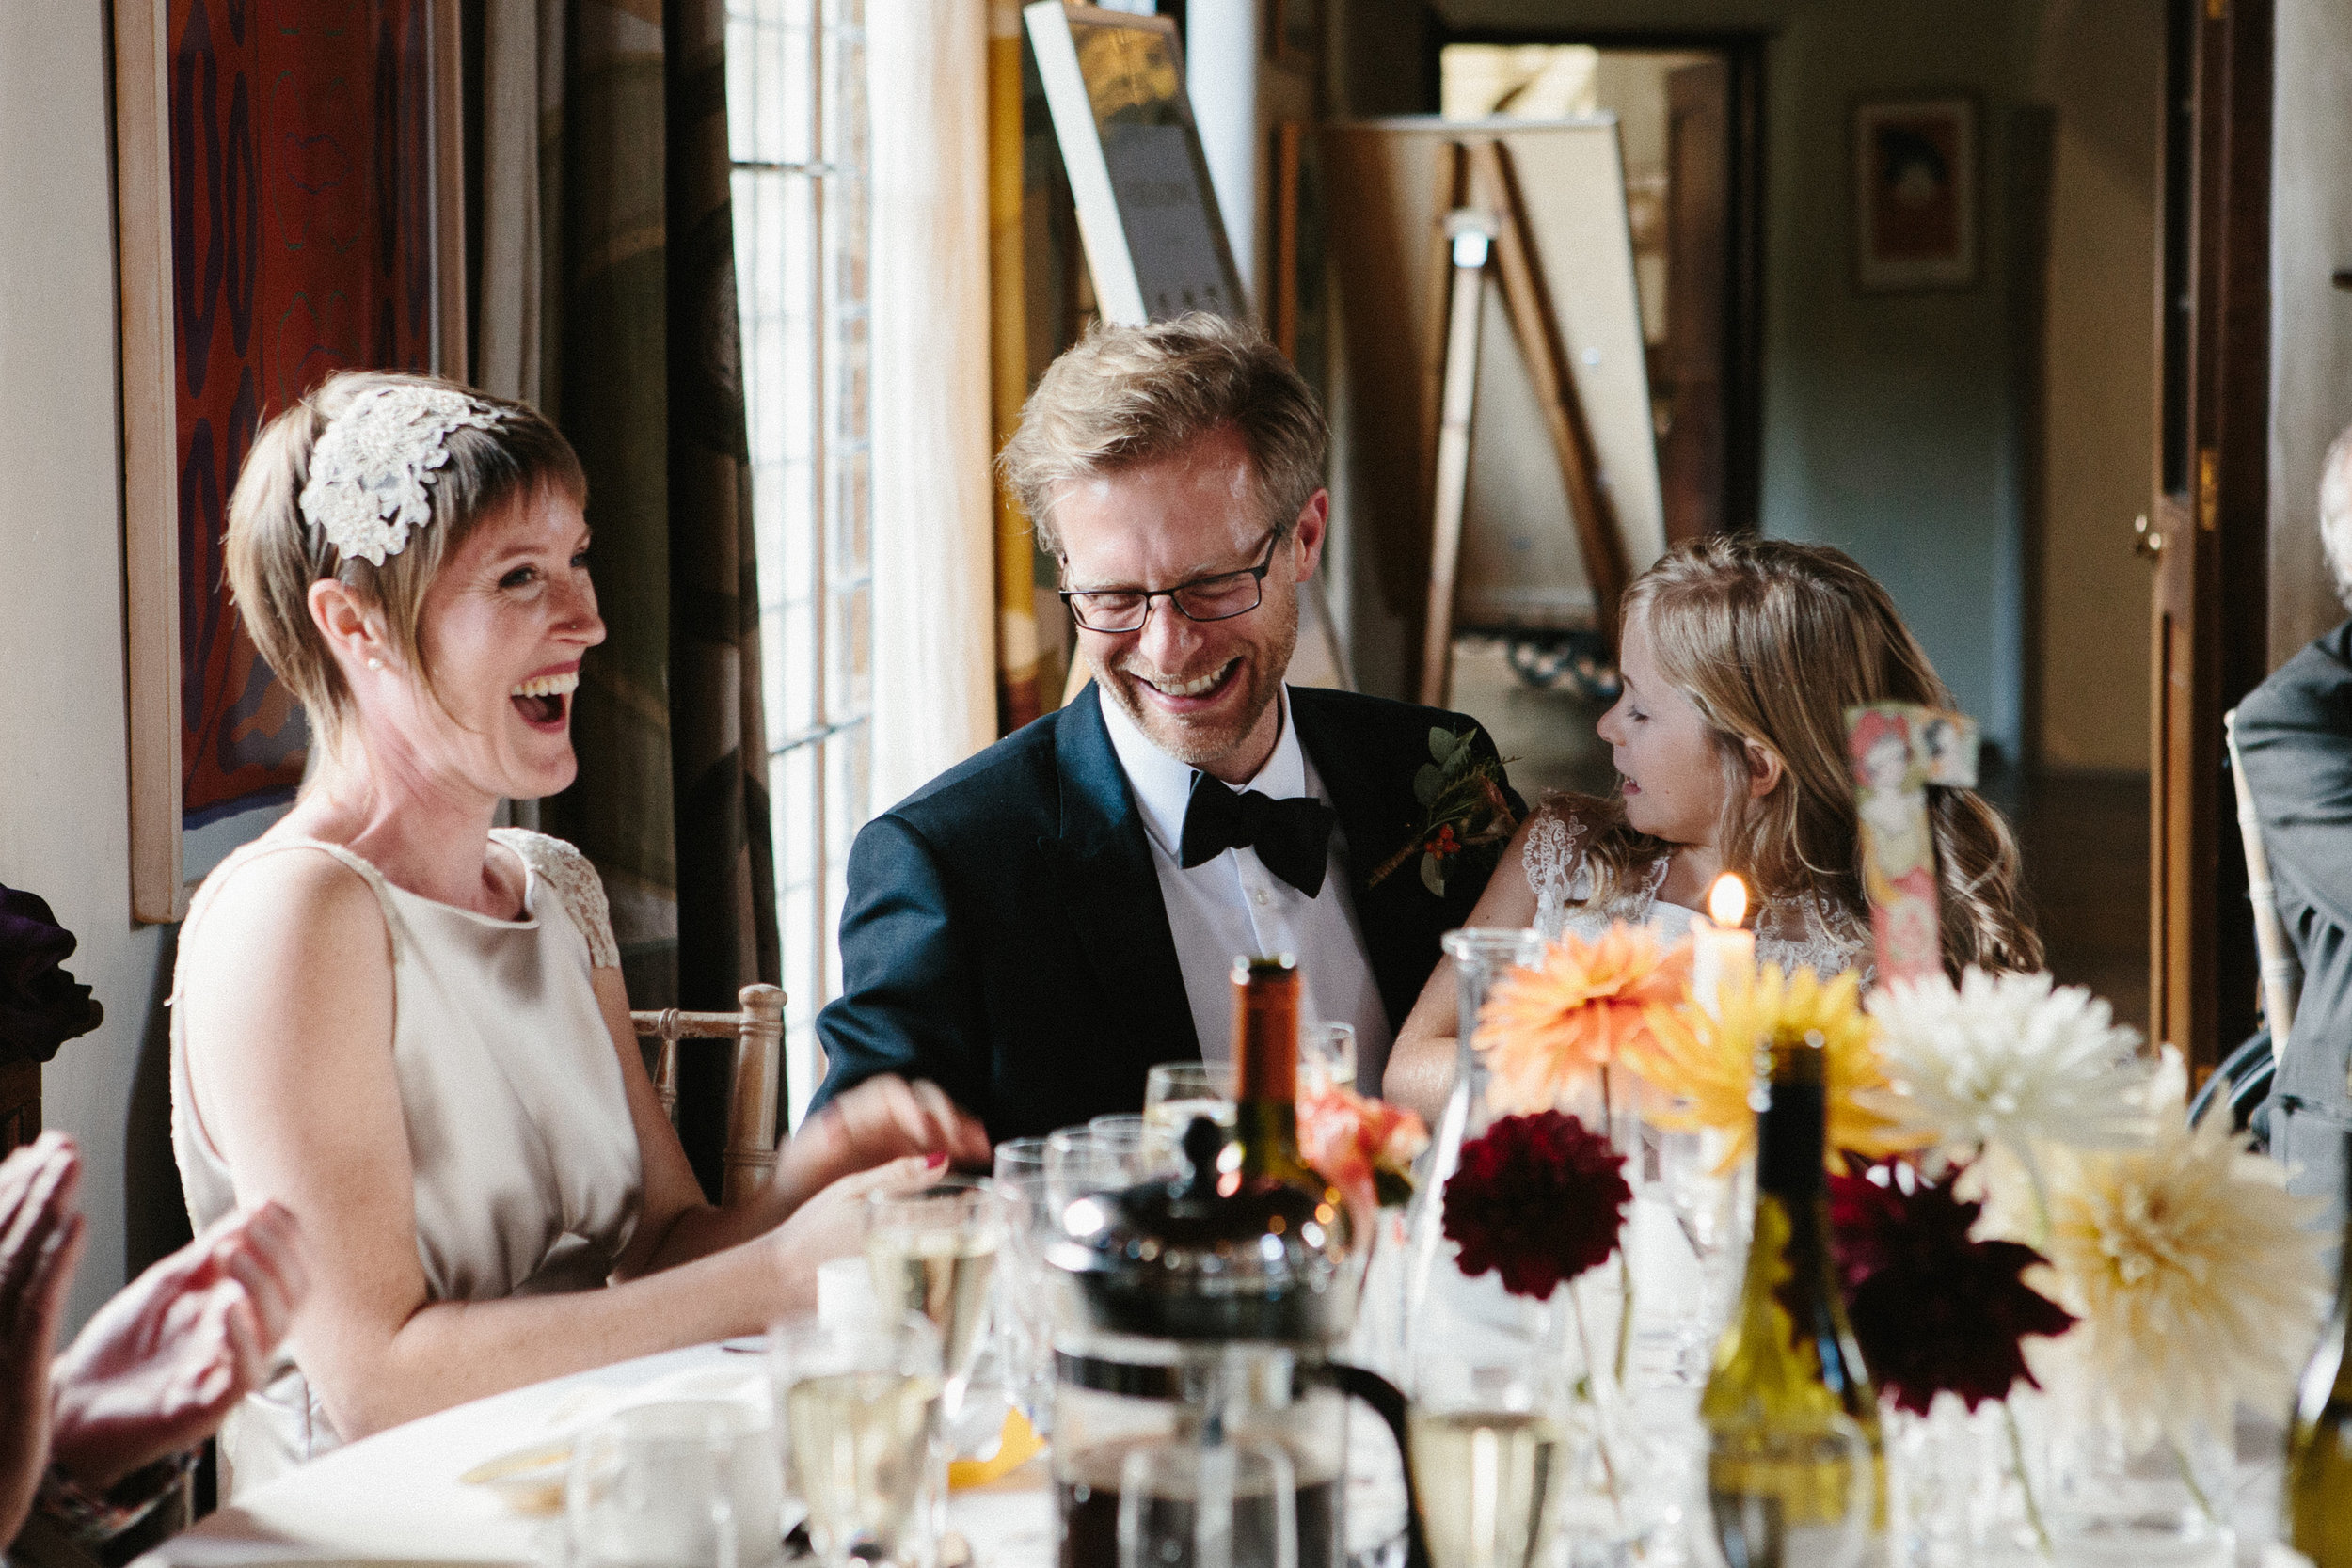 Kate-Beaumont-Sheffield-Honeysuckle-bias-cut-wedding-dress-oyster-Rosie24.jpg